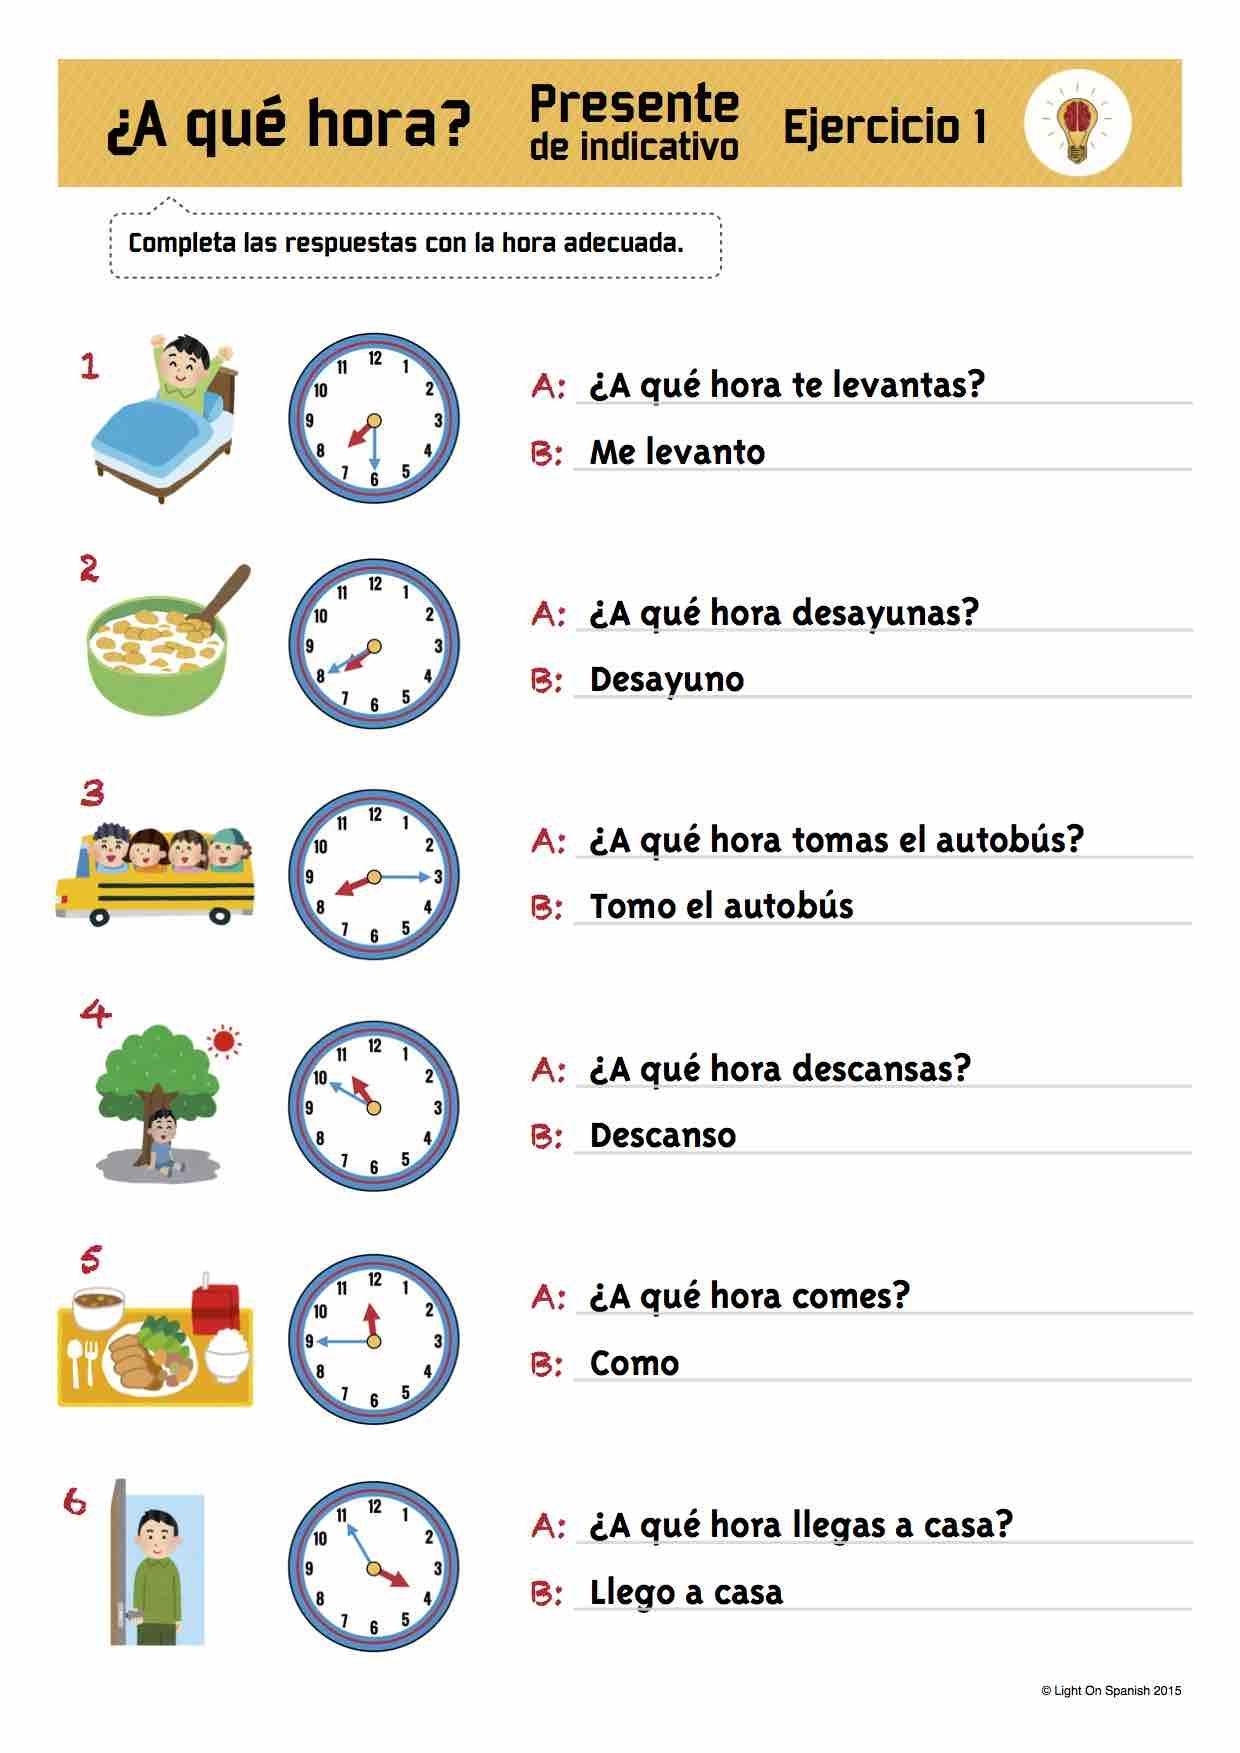 Spanish Time Amp Present Tense Verbs Exercises La Hora Presente De Indicativo